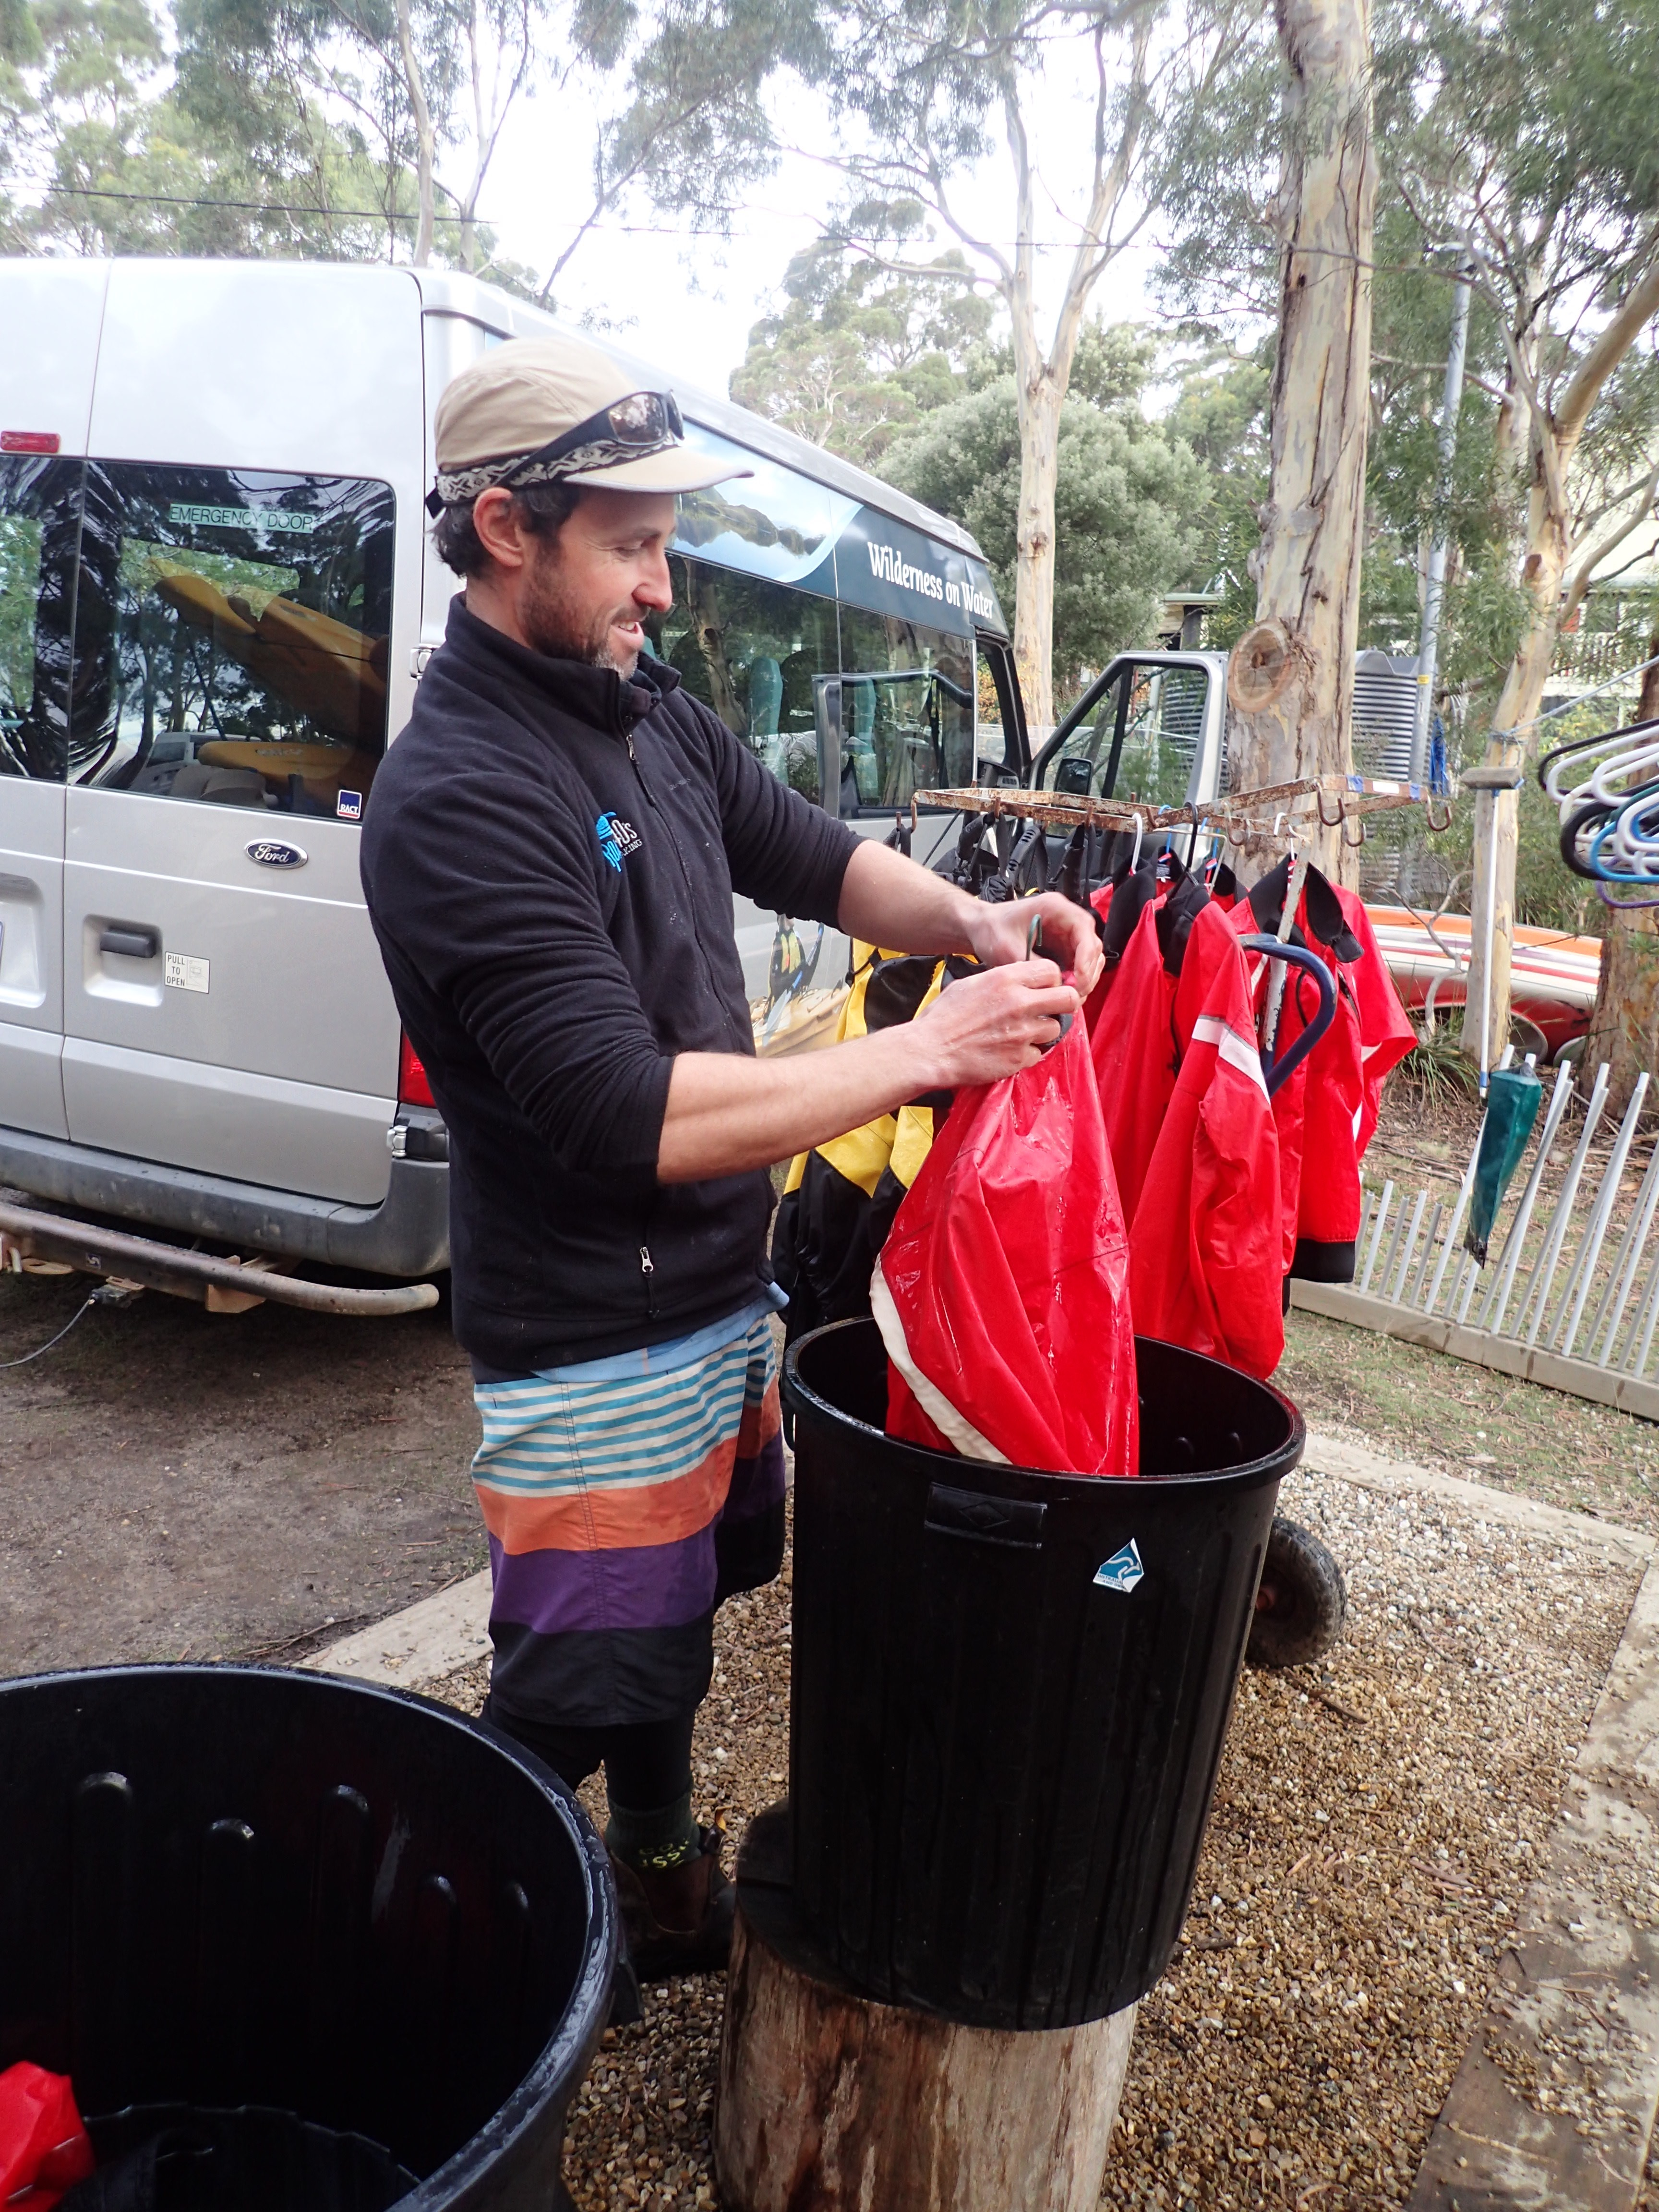 Kayak Hygiene - cleaning a kayak